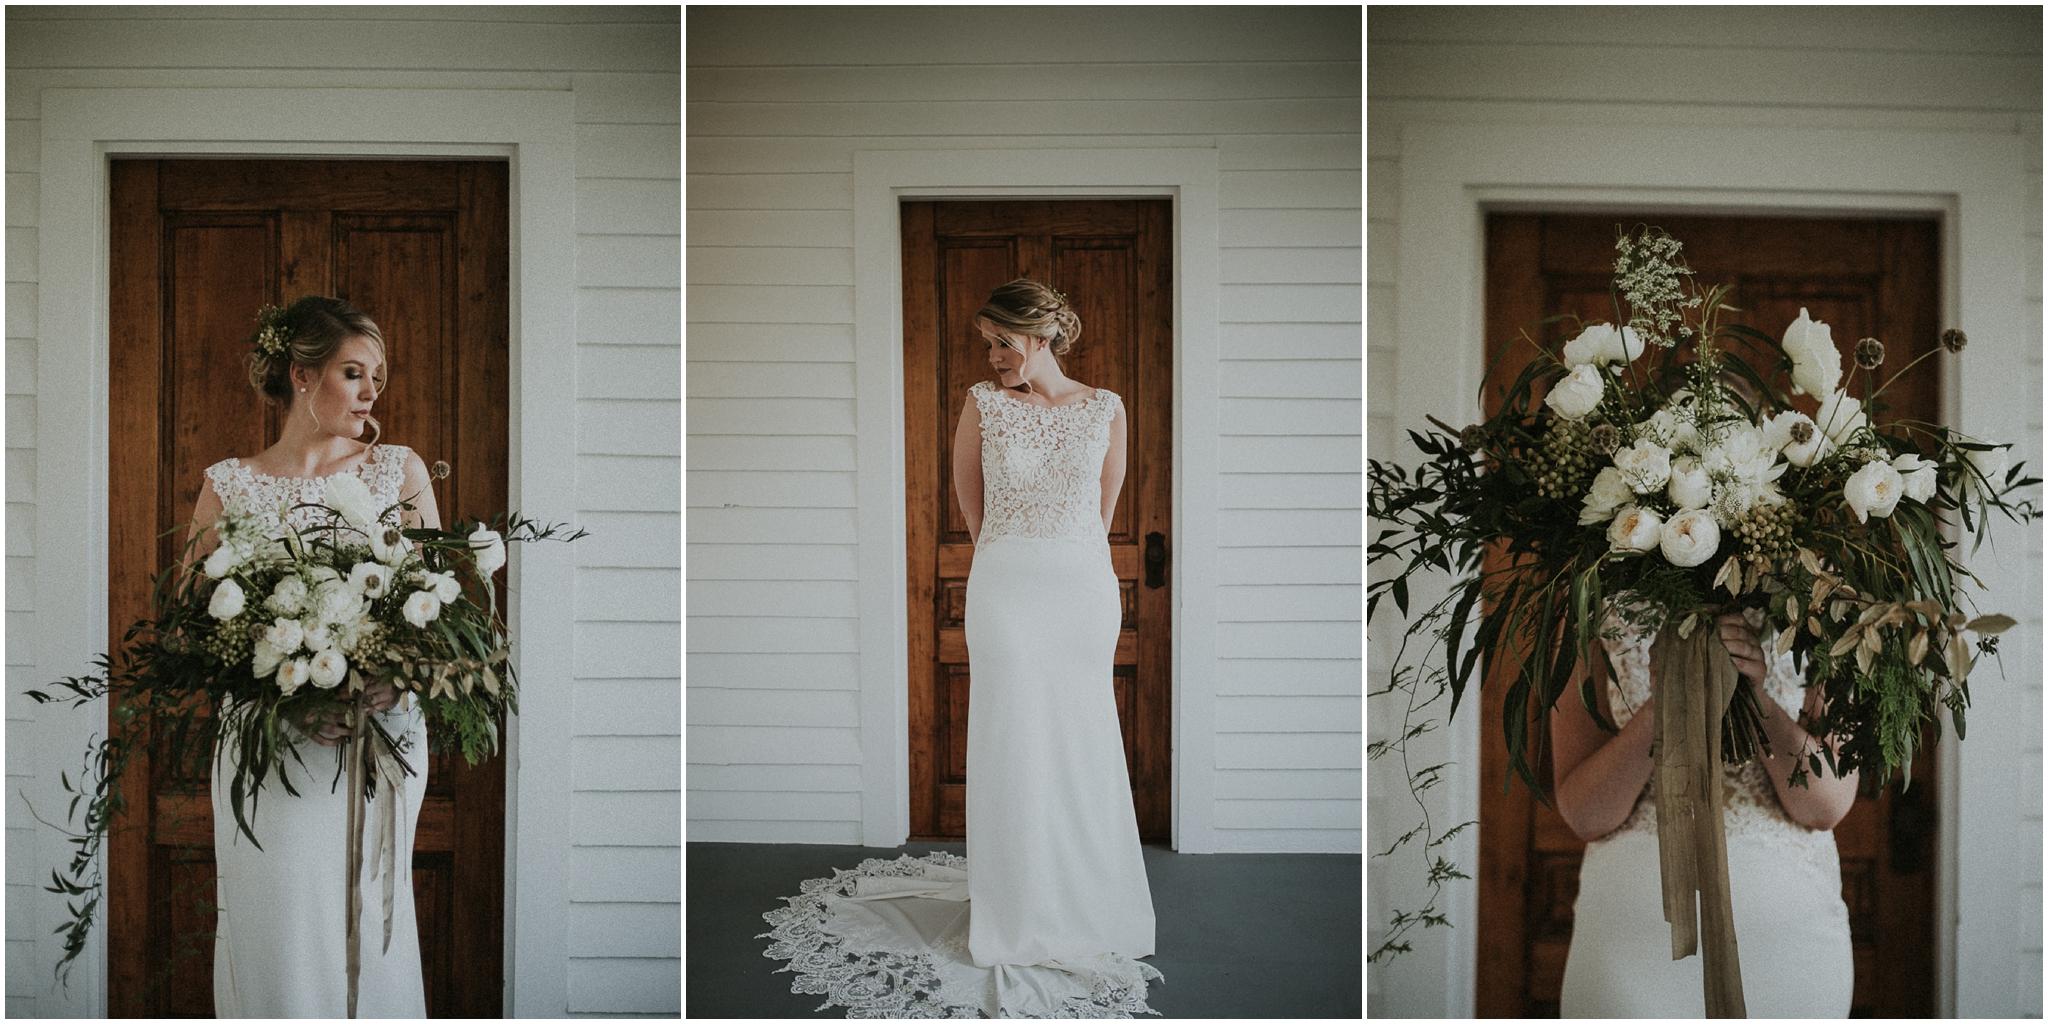 Wedding-photographer-ritchie-hill_0019.jpg